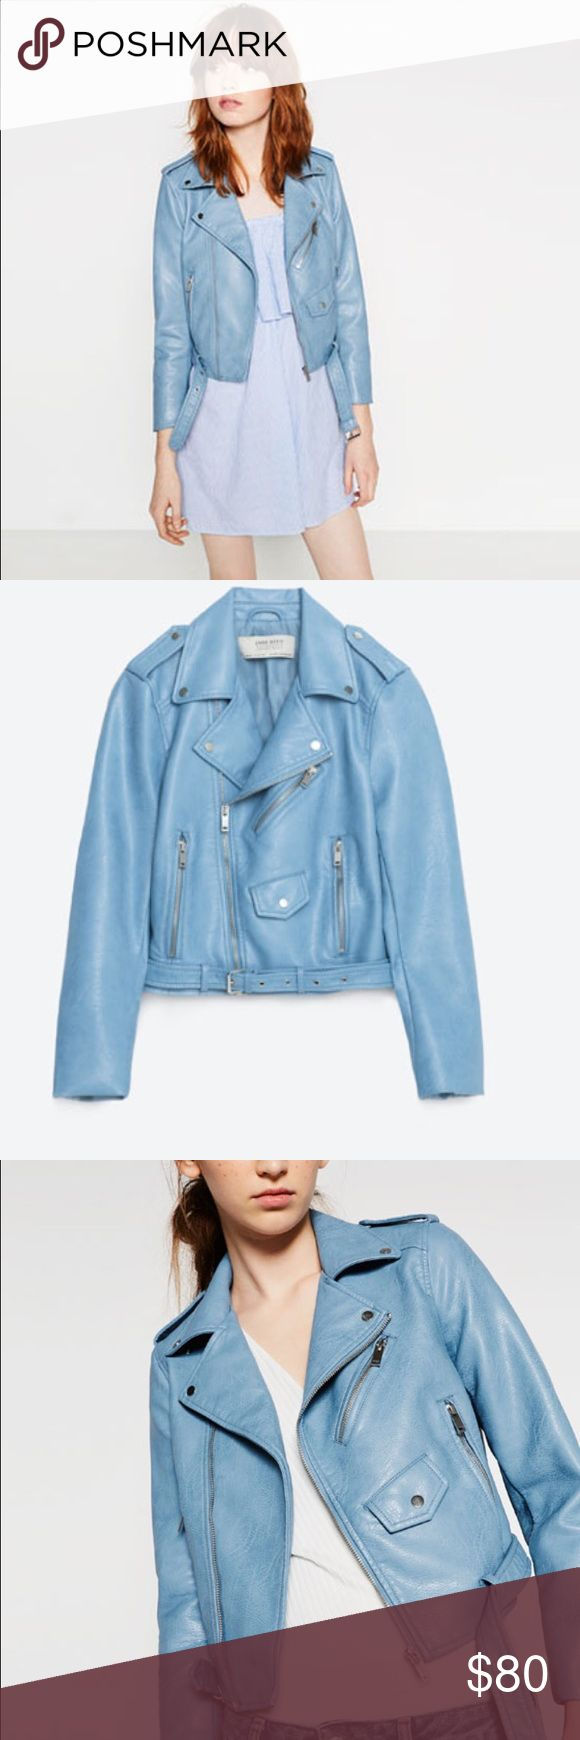 NWOT Zara Leather Jacket Gorgeous NWOT sky blue faux leather jacket from Zara❣ medium but fits on the small-medium side Zara Jackets & Coats